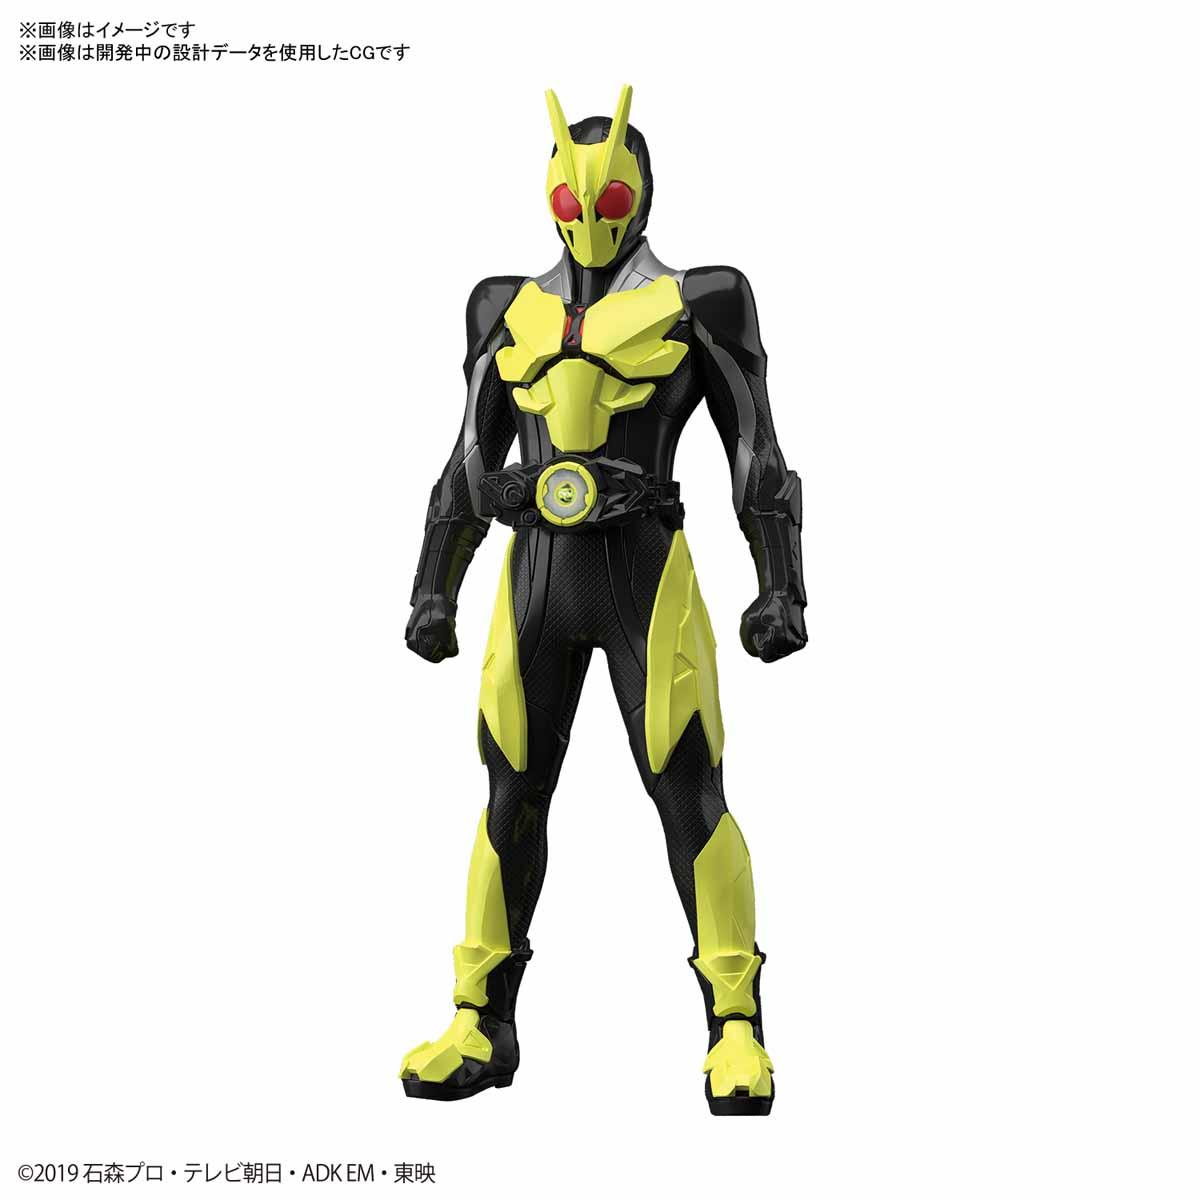 ENTRY GRADE『仮面ライダーゼロワン ライジングホッパー』プラモデル-001